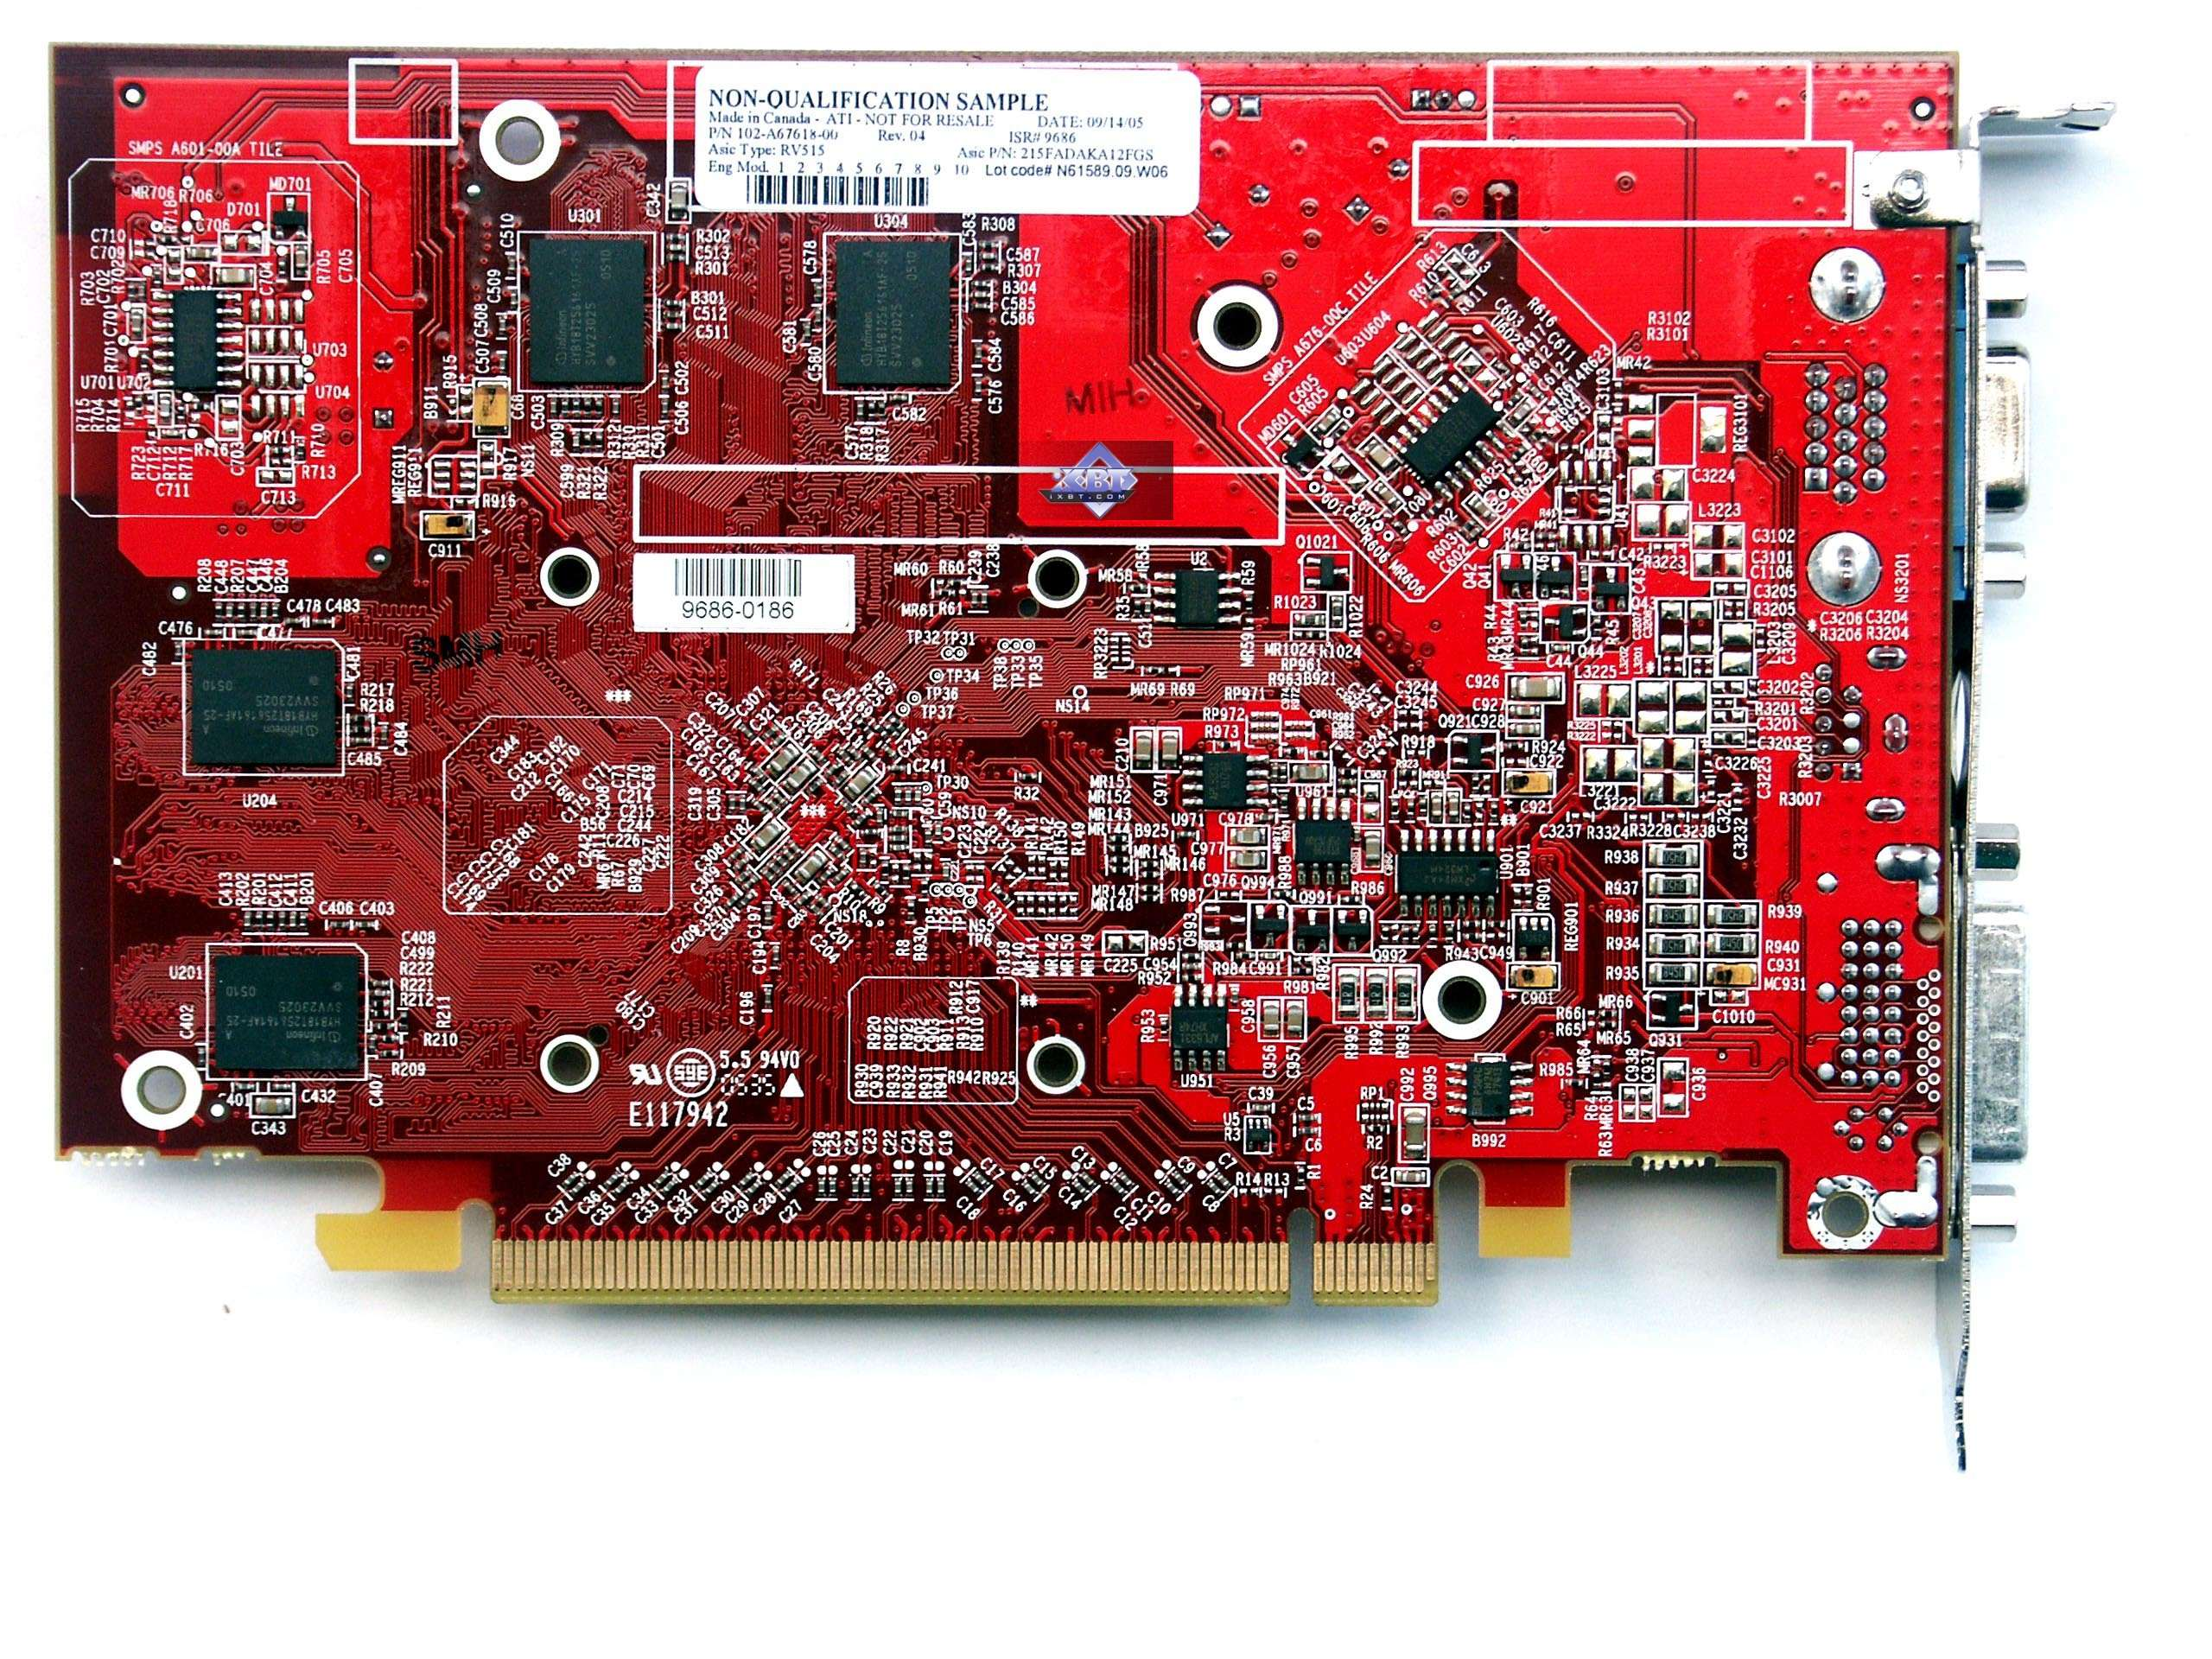 Amazon. Com: new ati radeon x1300 pro 256mb agp dvi vga graphics.